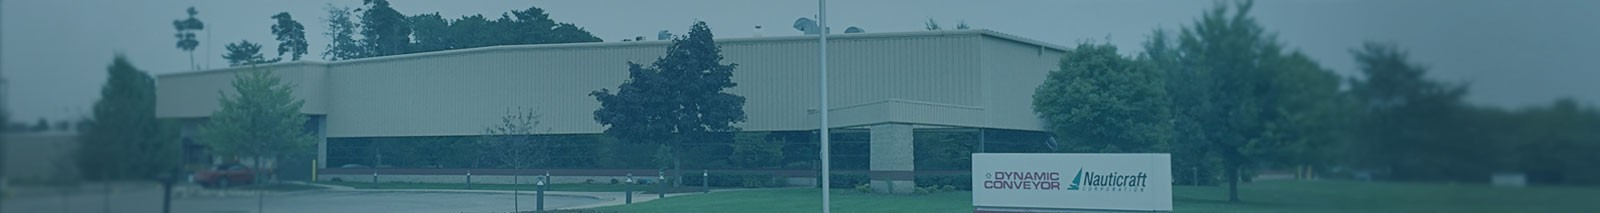 Dynamic Conveyor Corporate Headquarters Muskegon MI